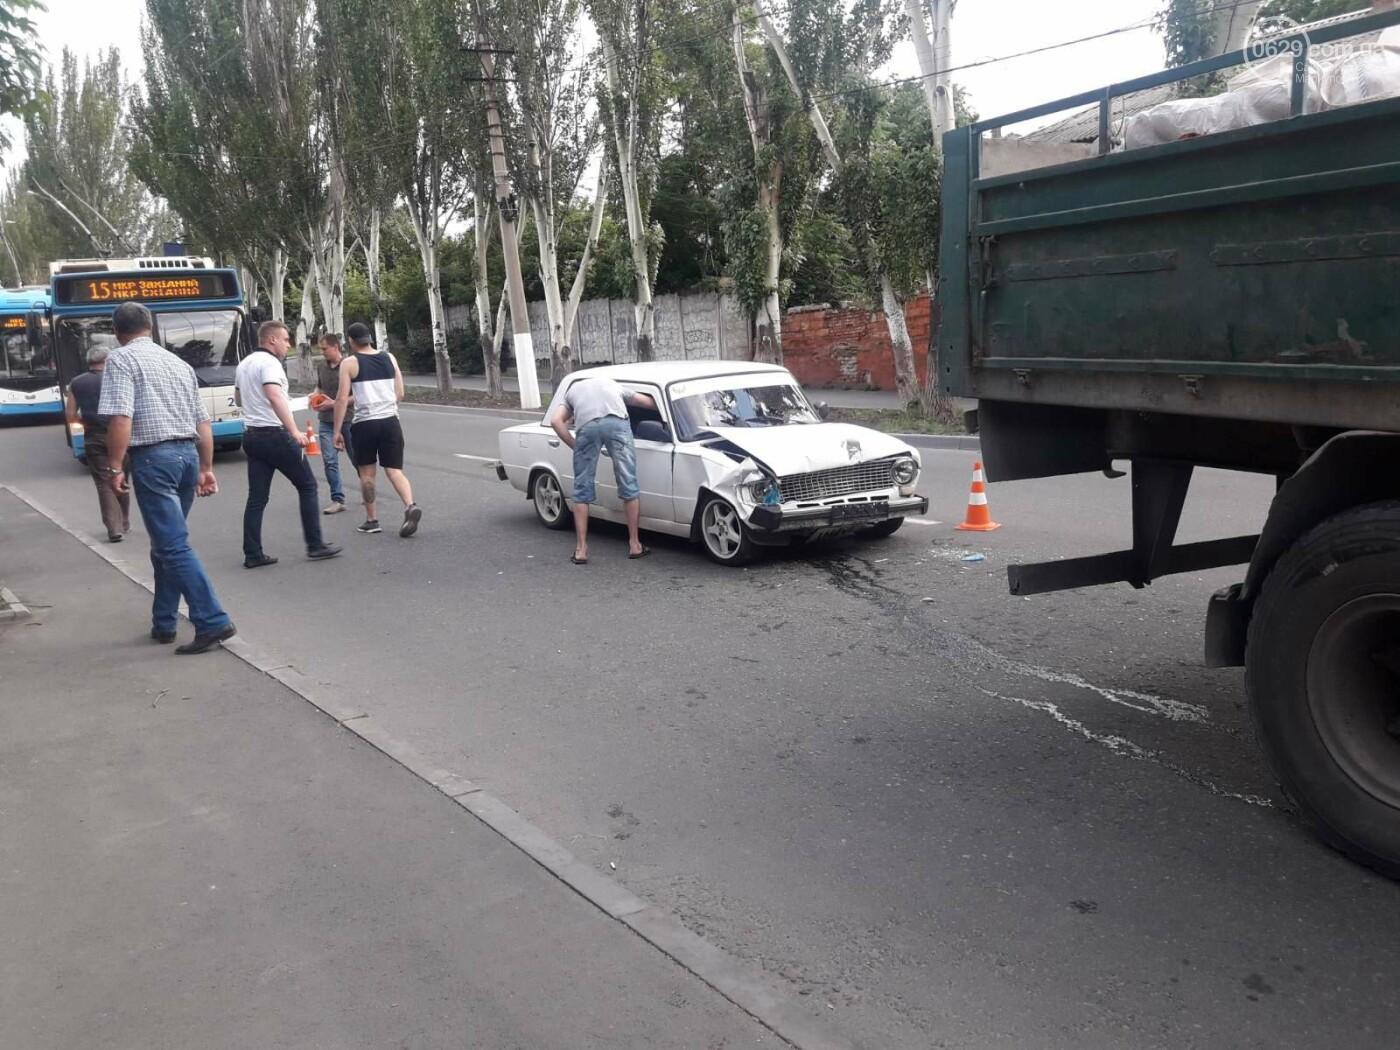 В Мариуполе «копейка» влетела в грузовик. Пострадала девушка, - ФОТО, фото-5